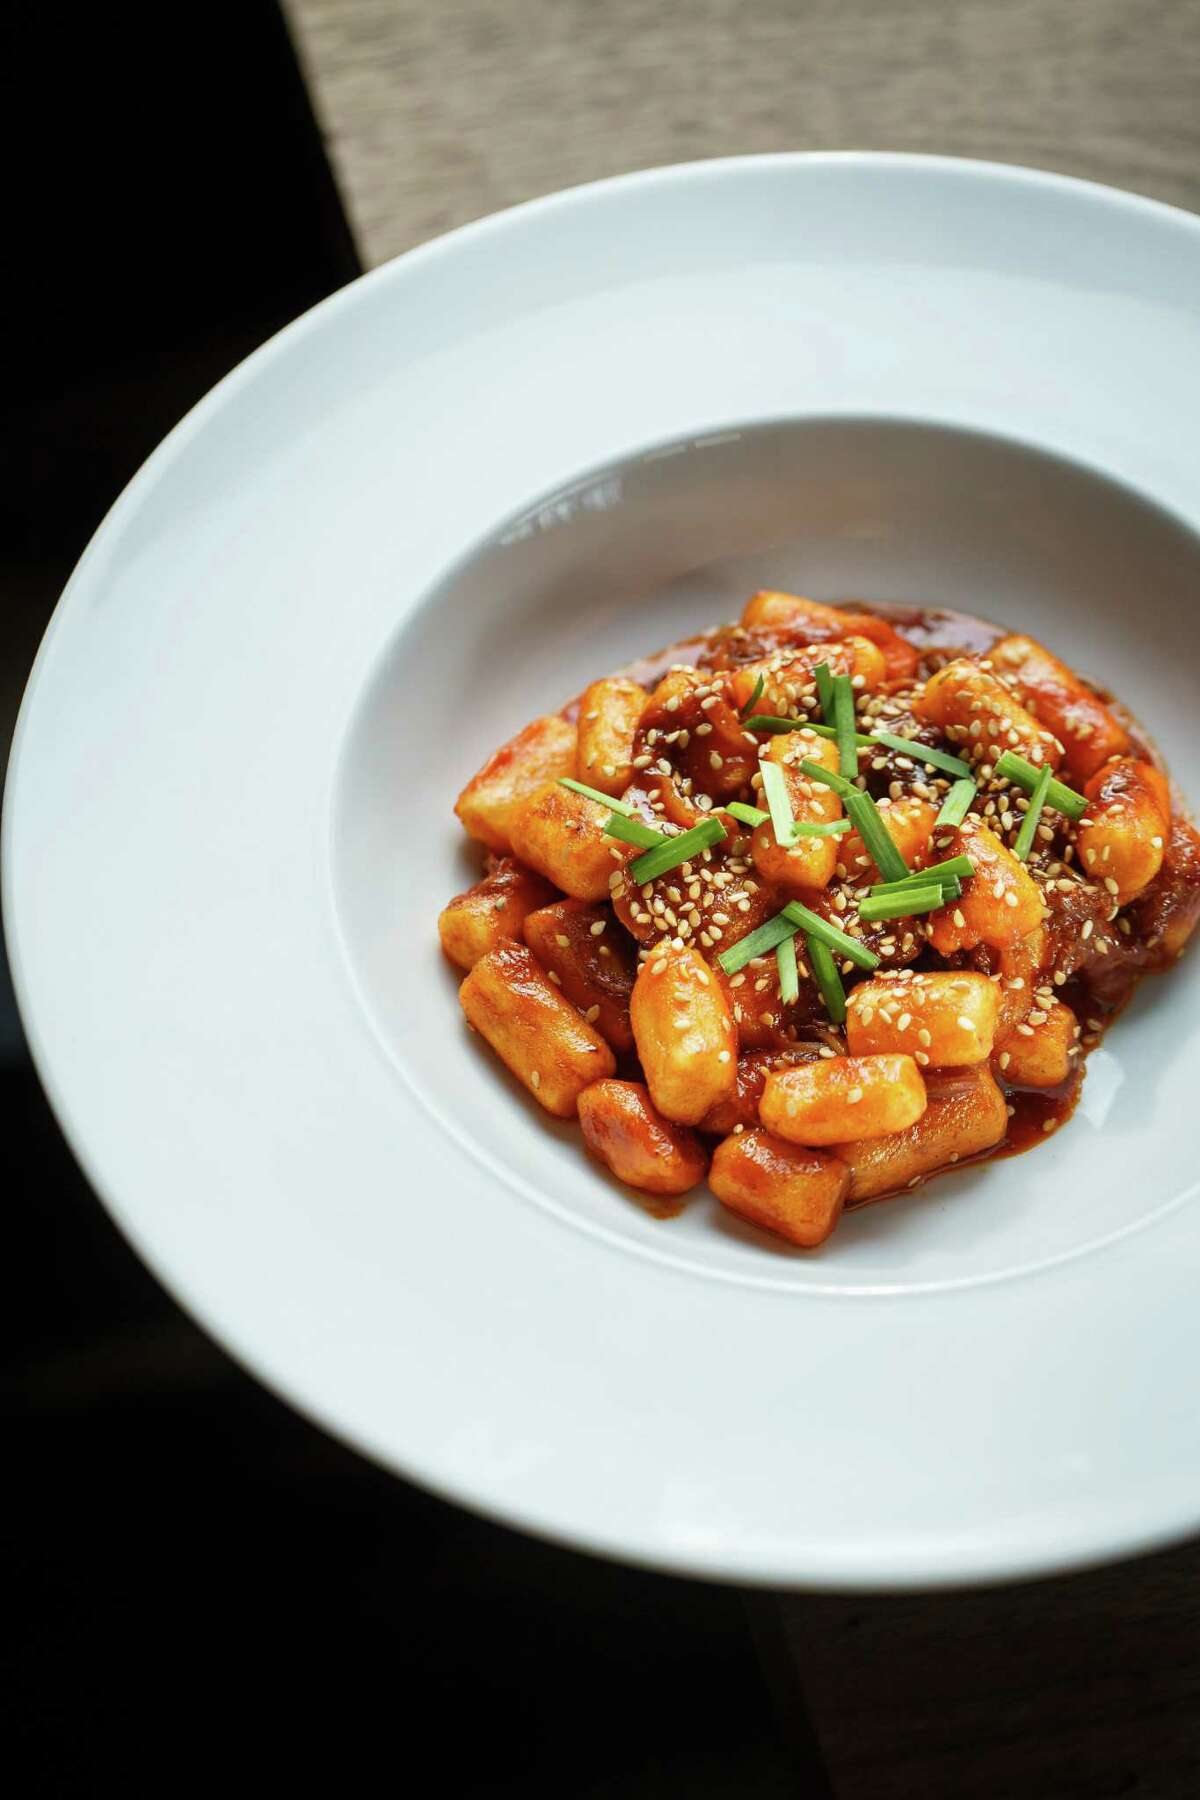 Korean Braised Goat and Dumplings at Underbelly